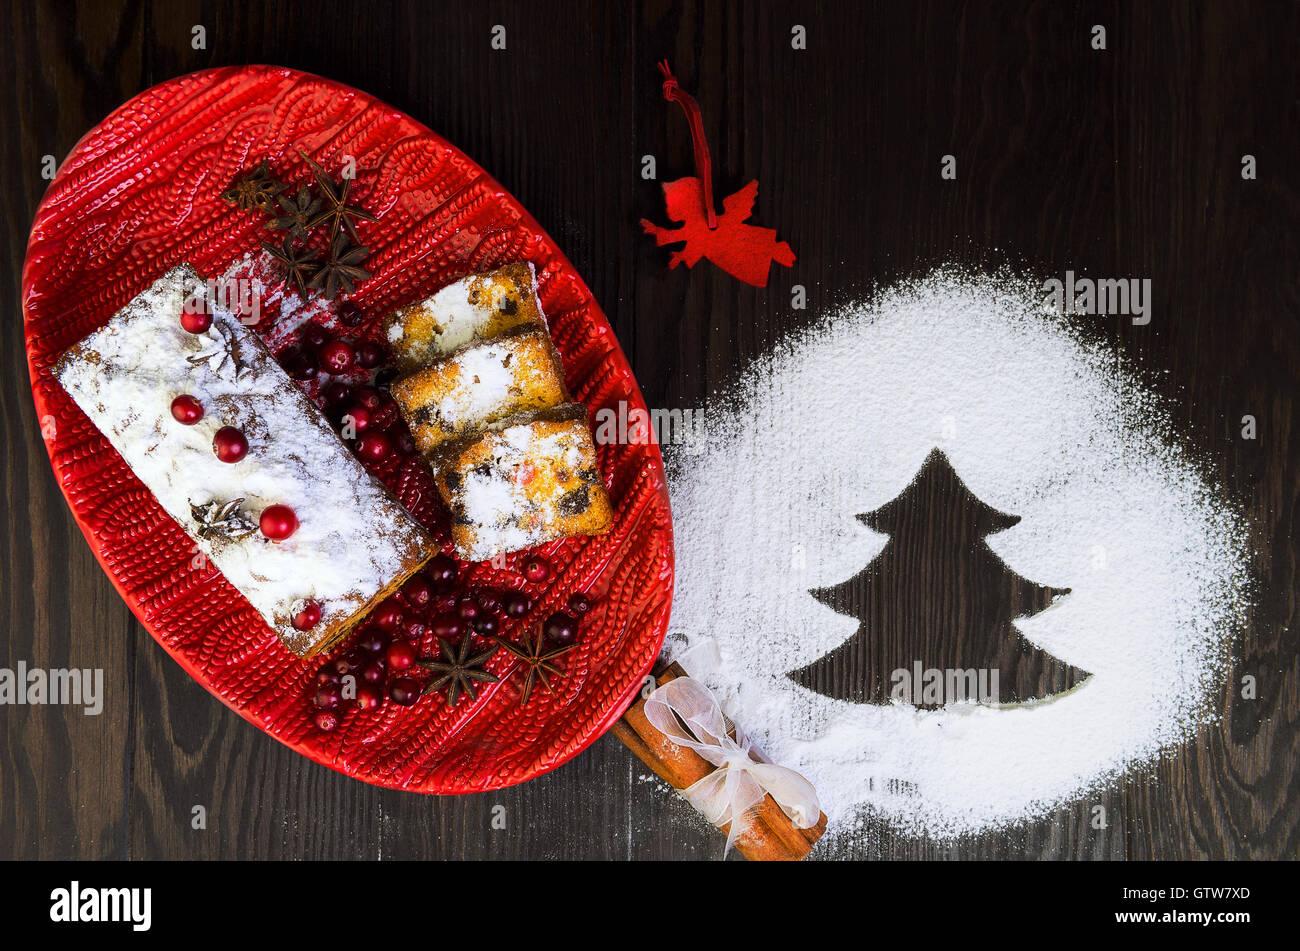 Crochet Christmas Decoration Stockfotos & Crochet Christmas ...